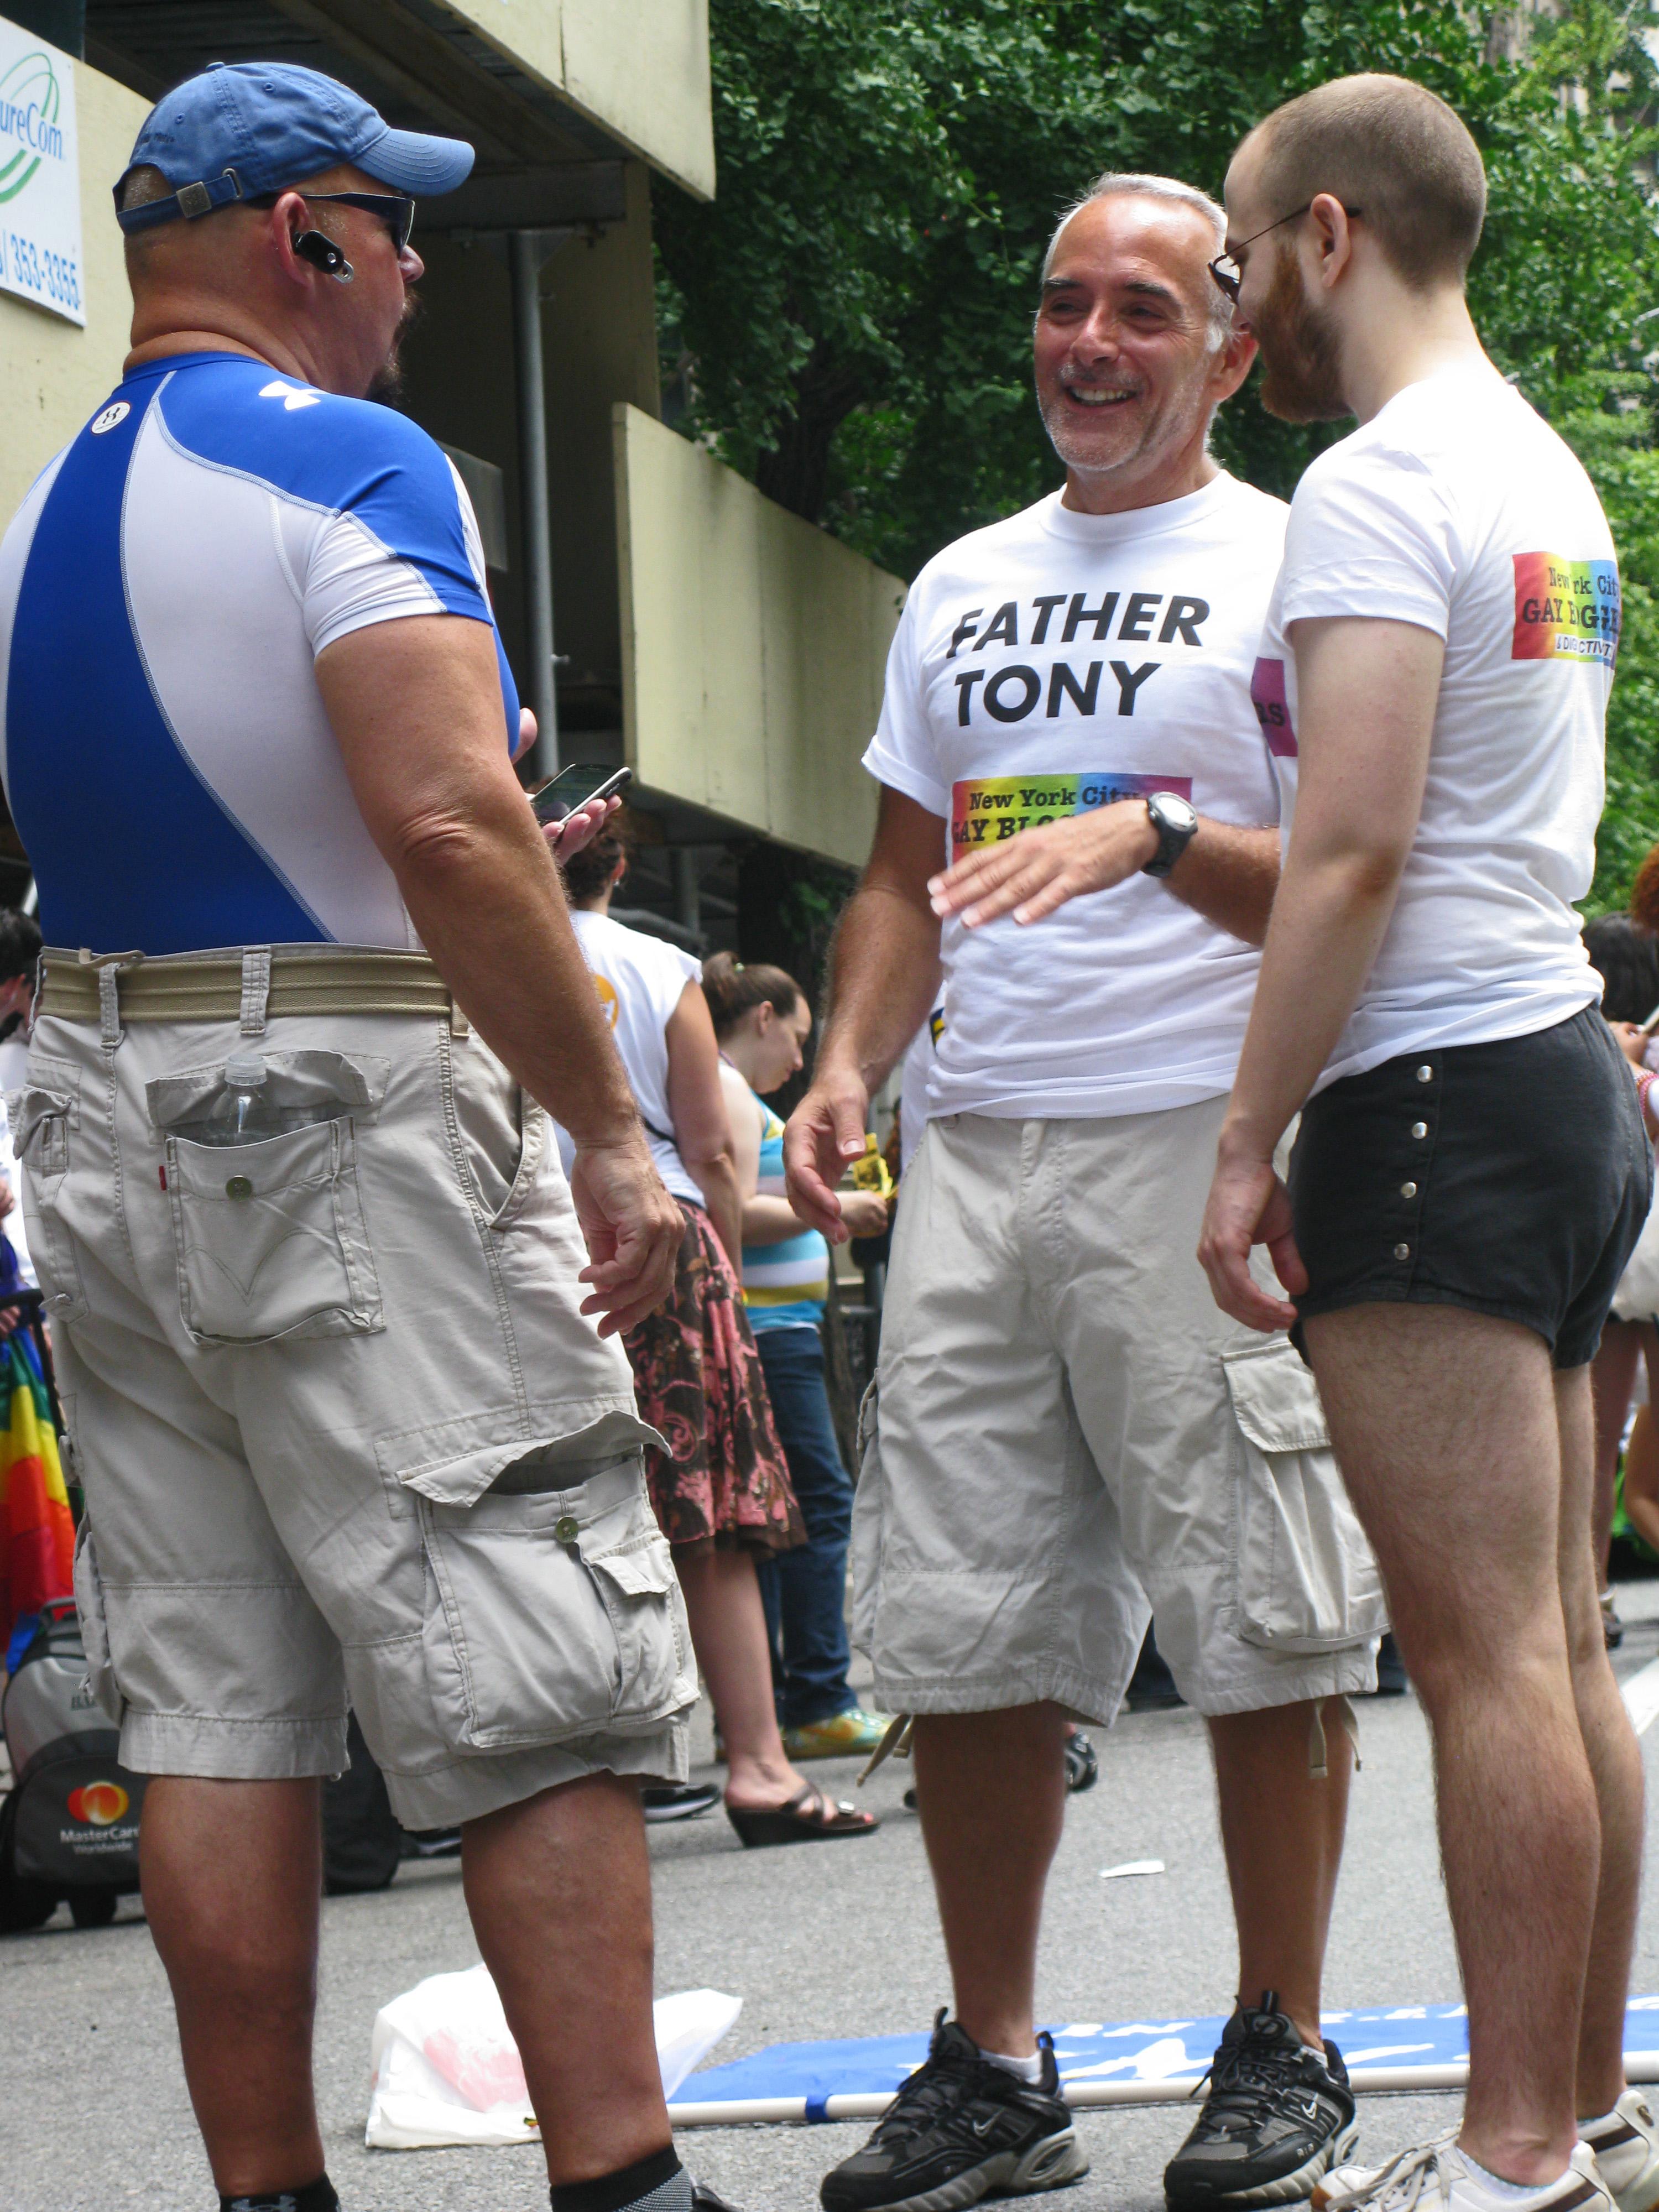 Gay bloger